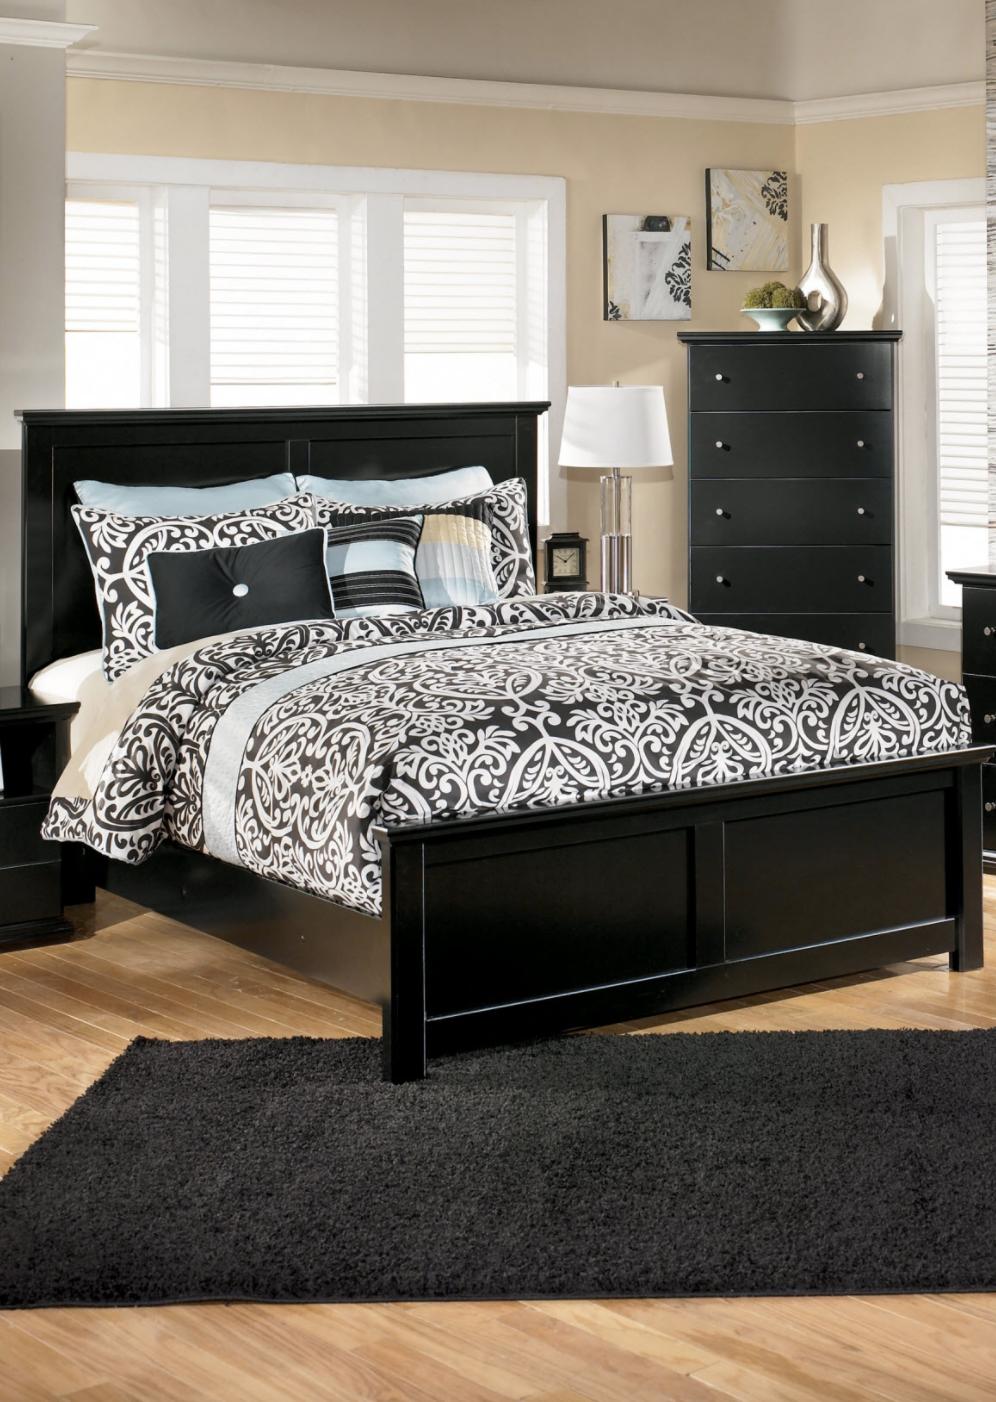 Black Dark Home Decor ideas Furniture, Master bedroom